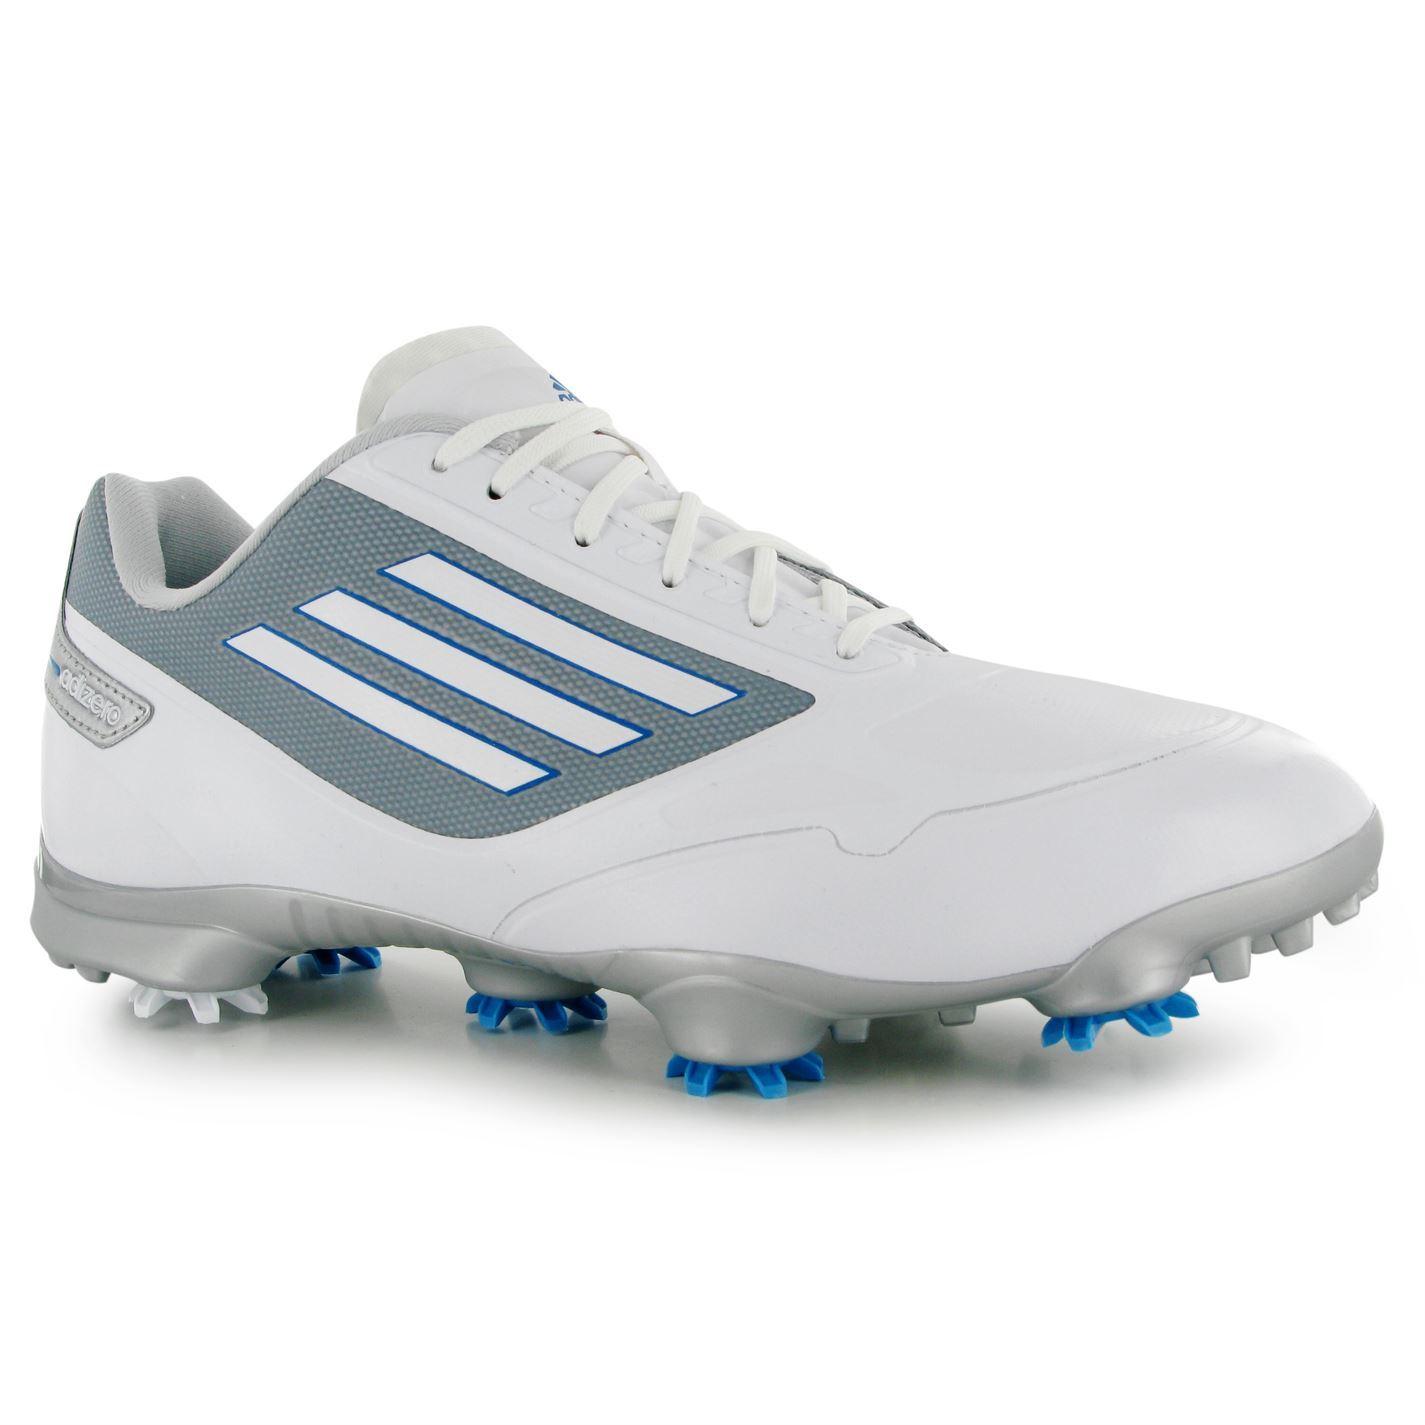 adidas adizero one wd golf shoes mens white golfing